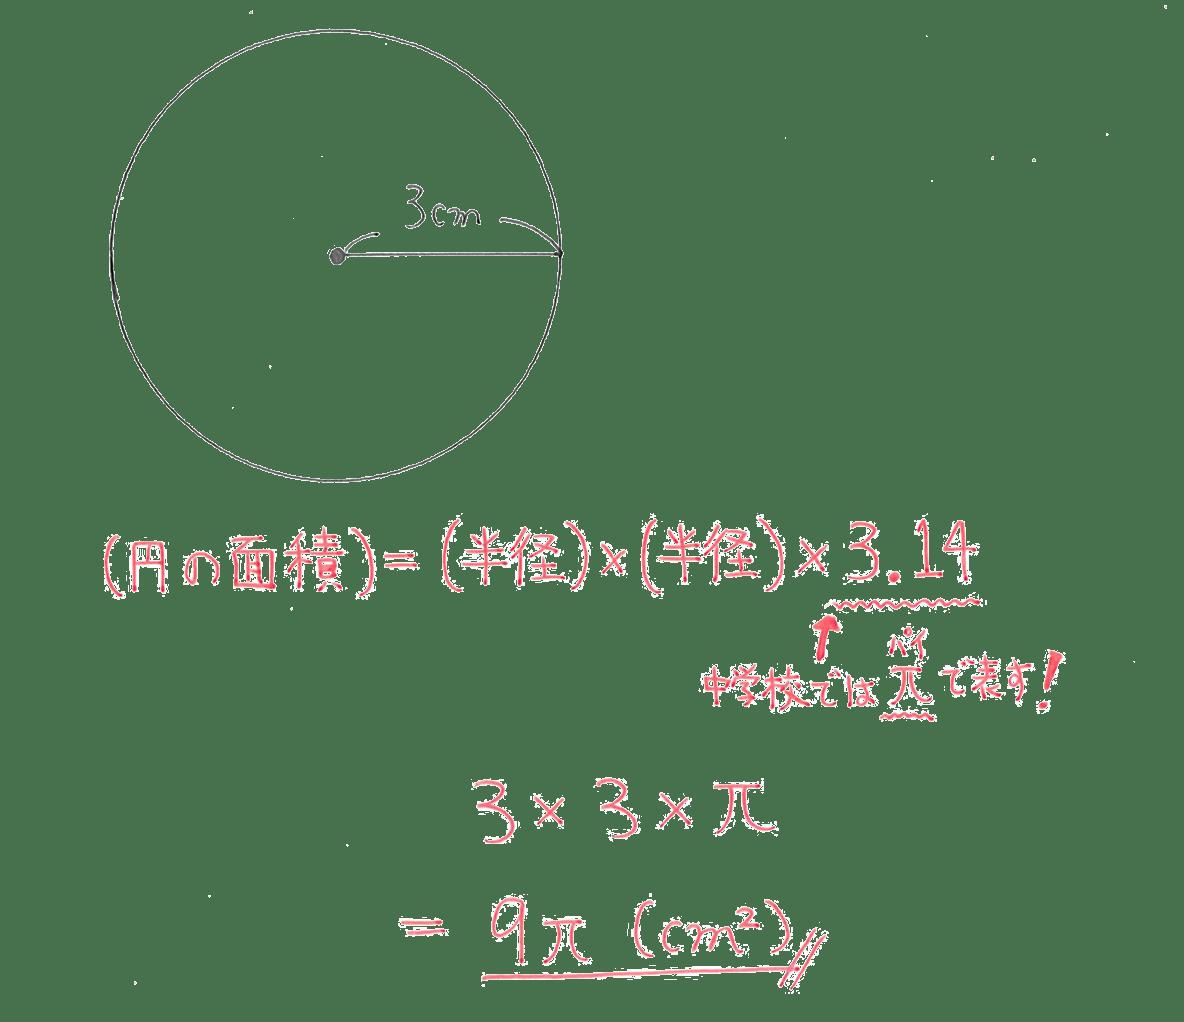 中1 数学21 例題 答え